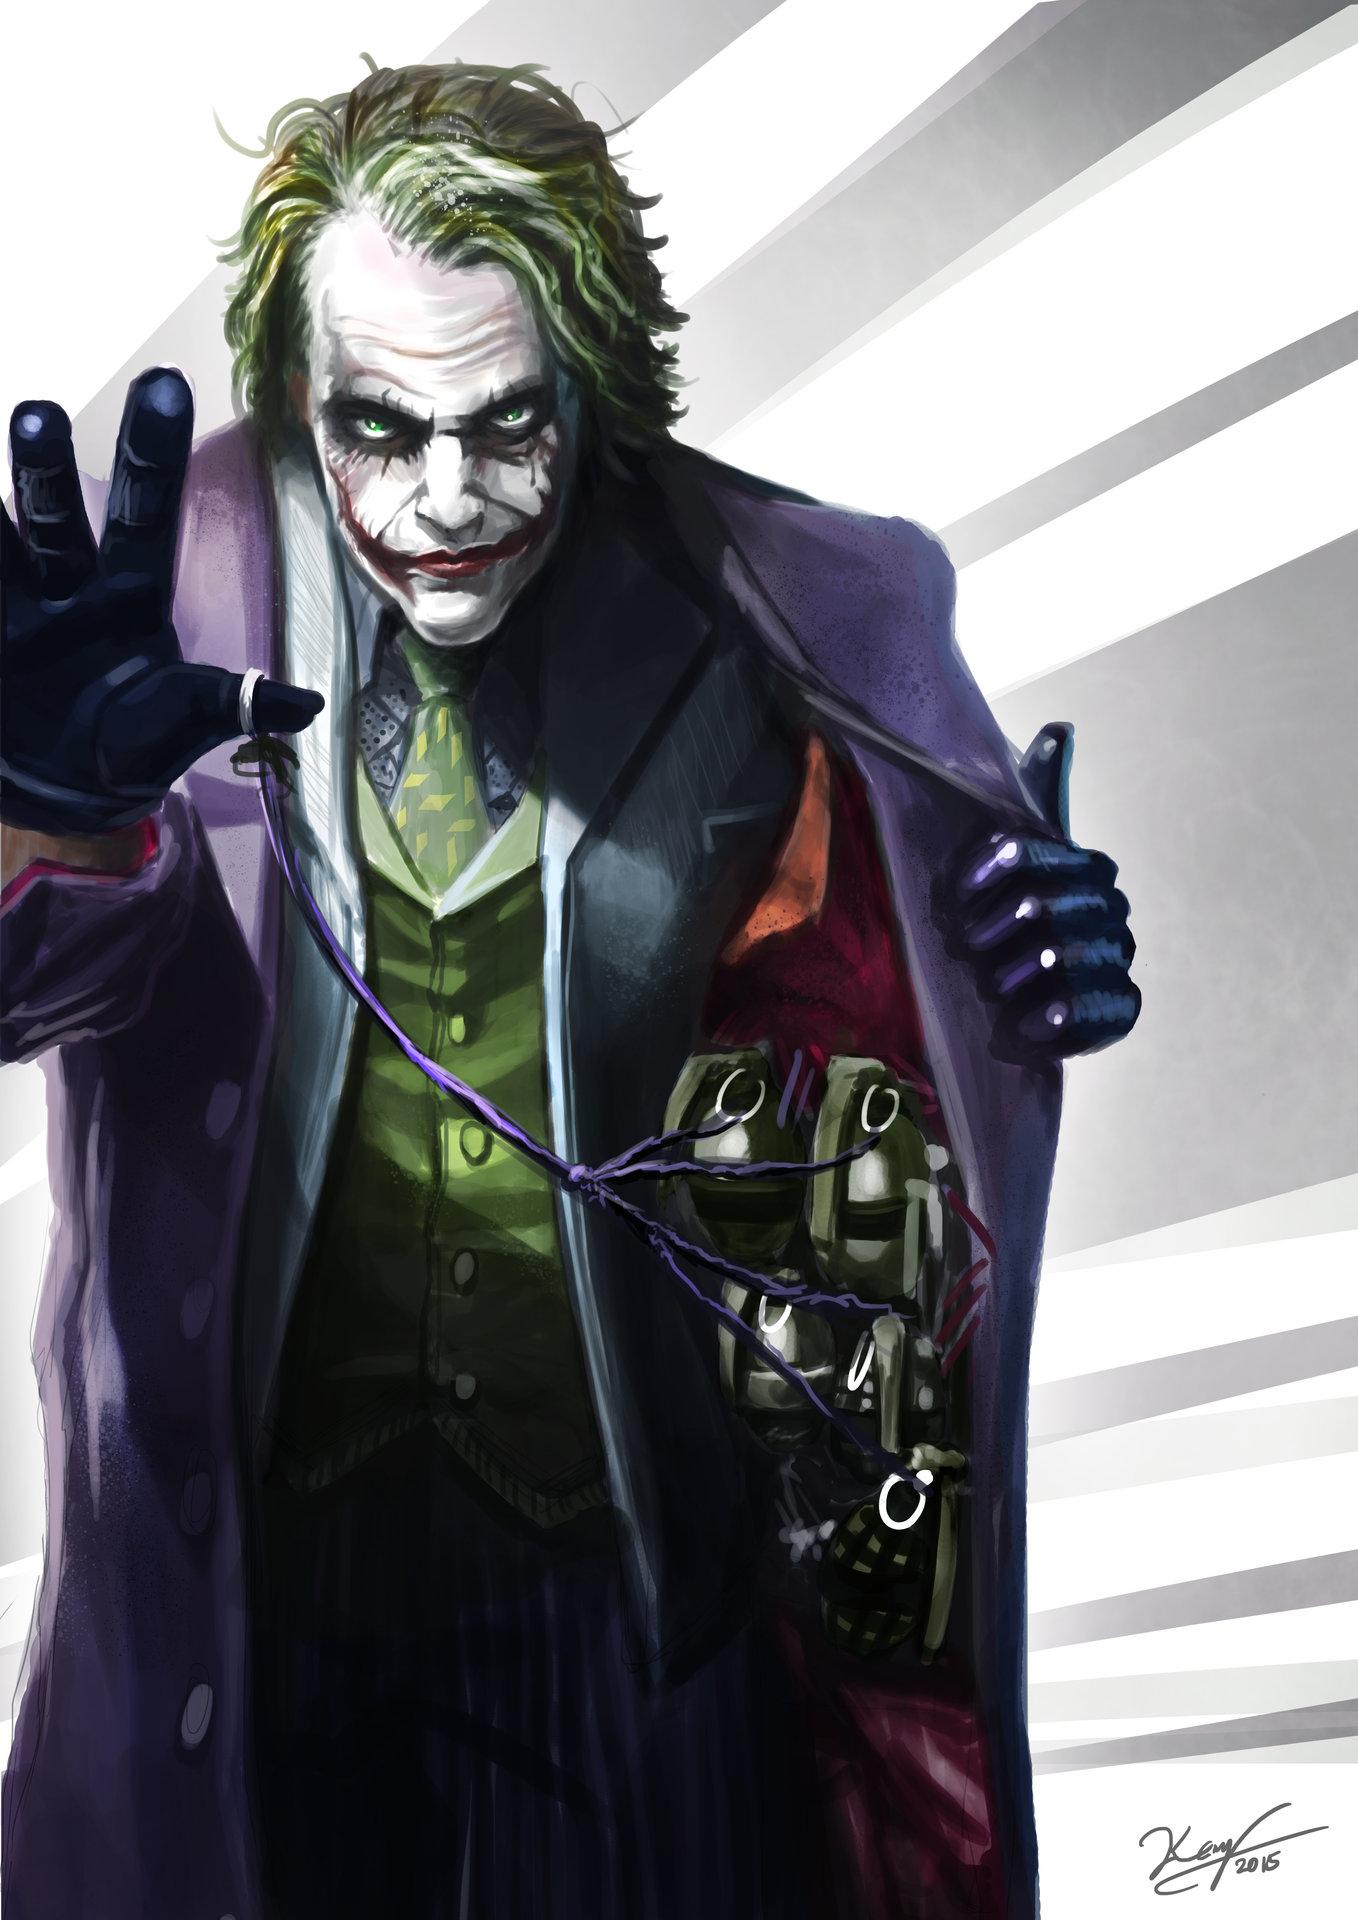 шут из бэтмена картинки это союз двух